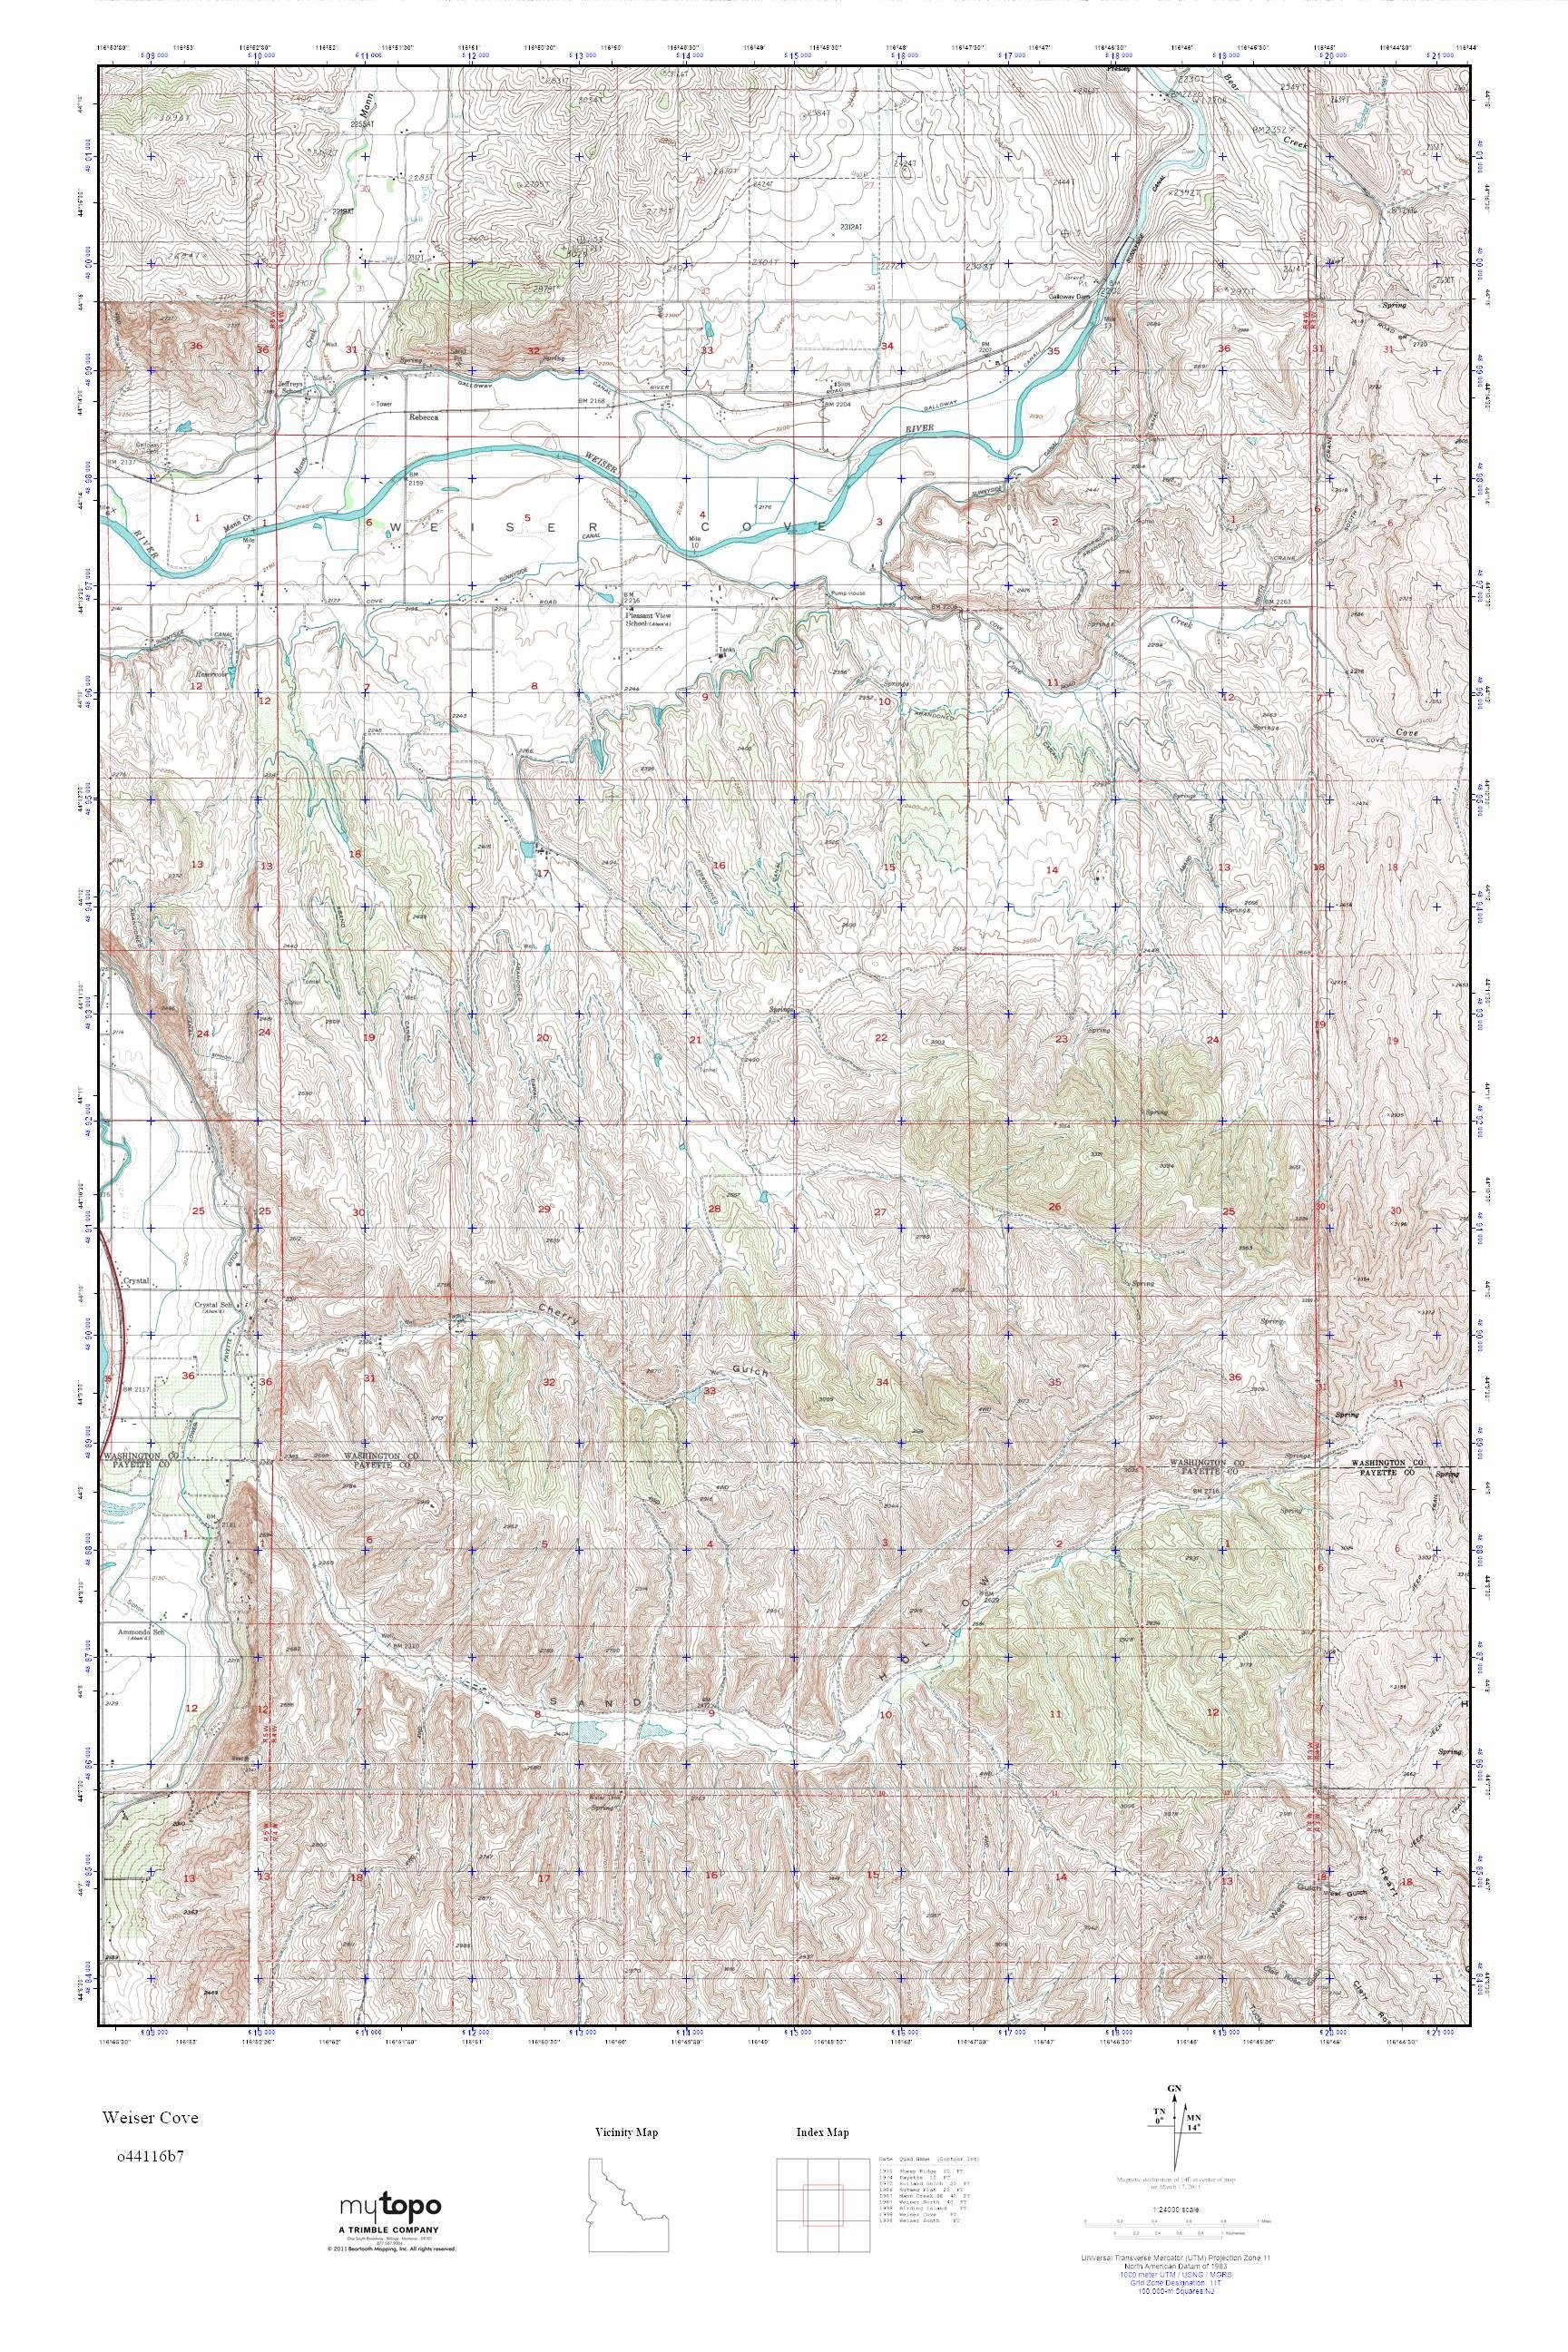 Mytopo Weiser Cove Idaho Usgs Quad Topo Map